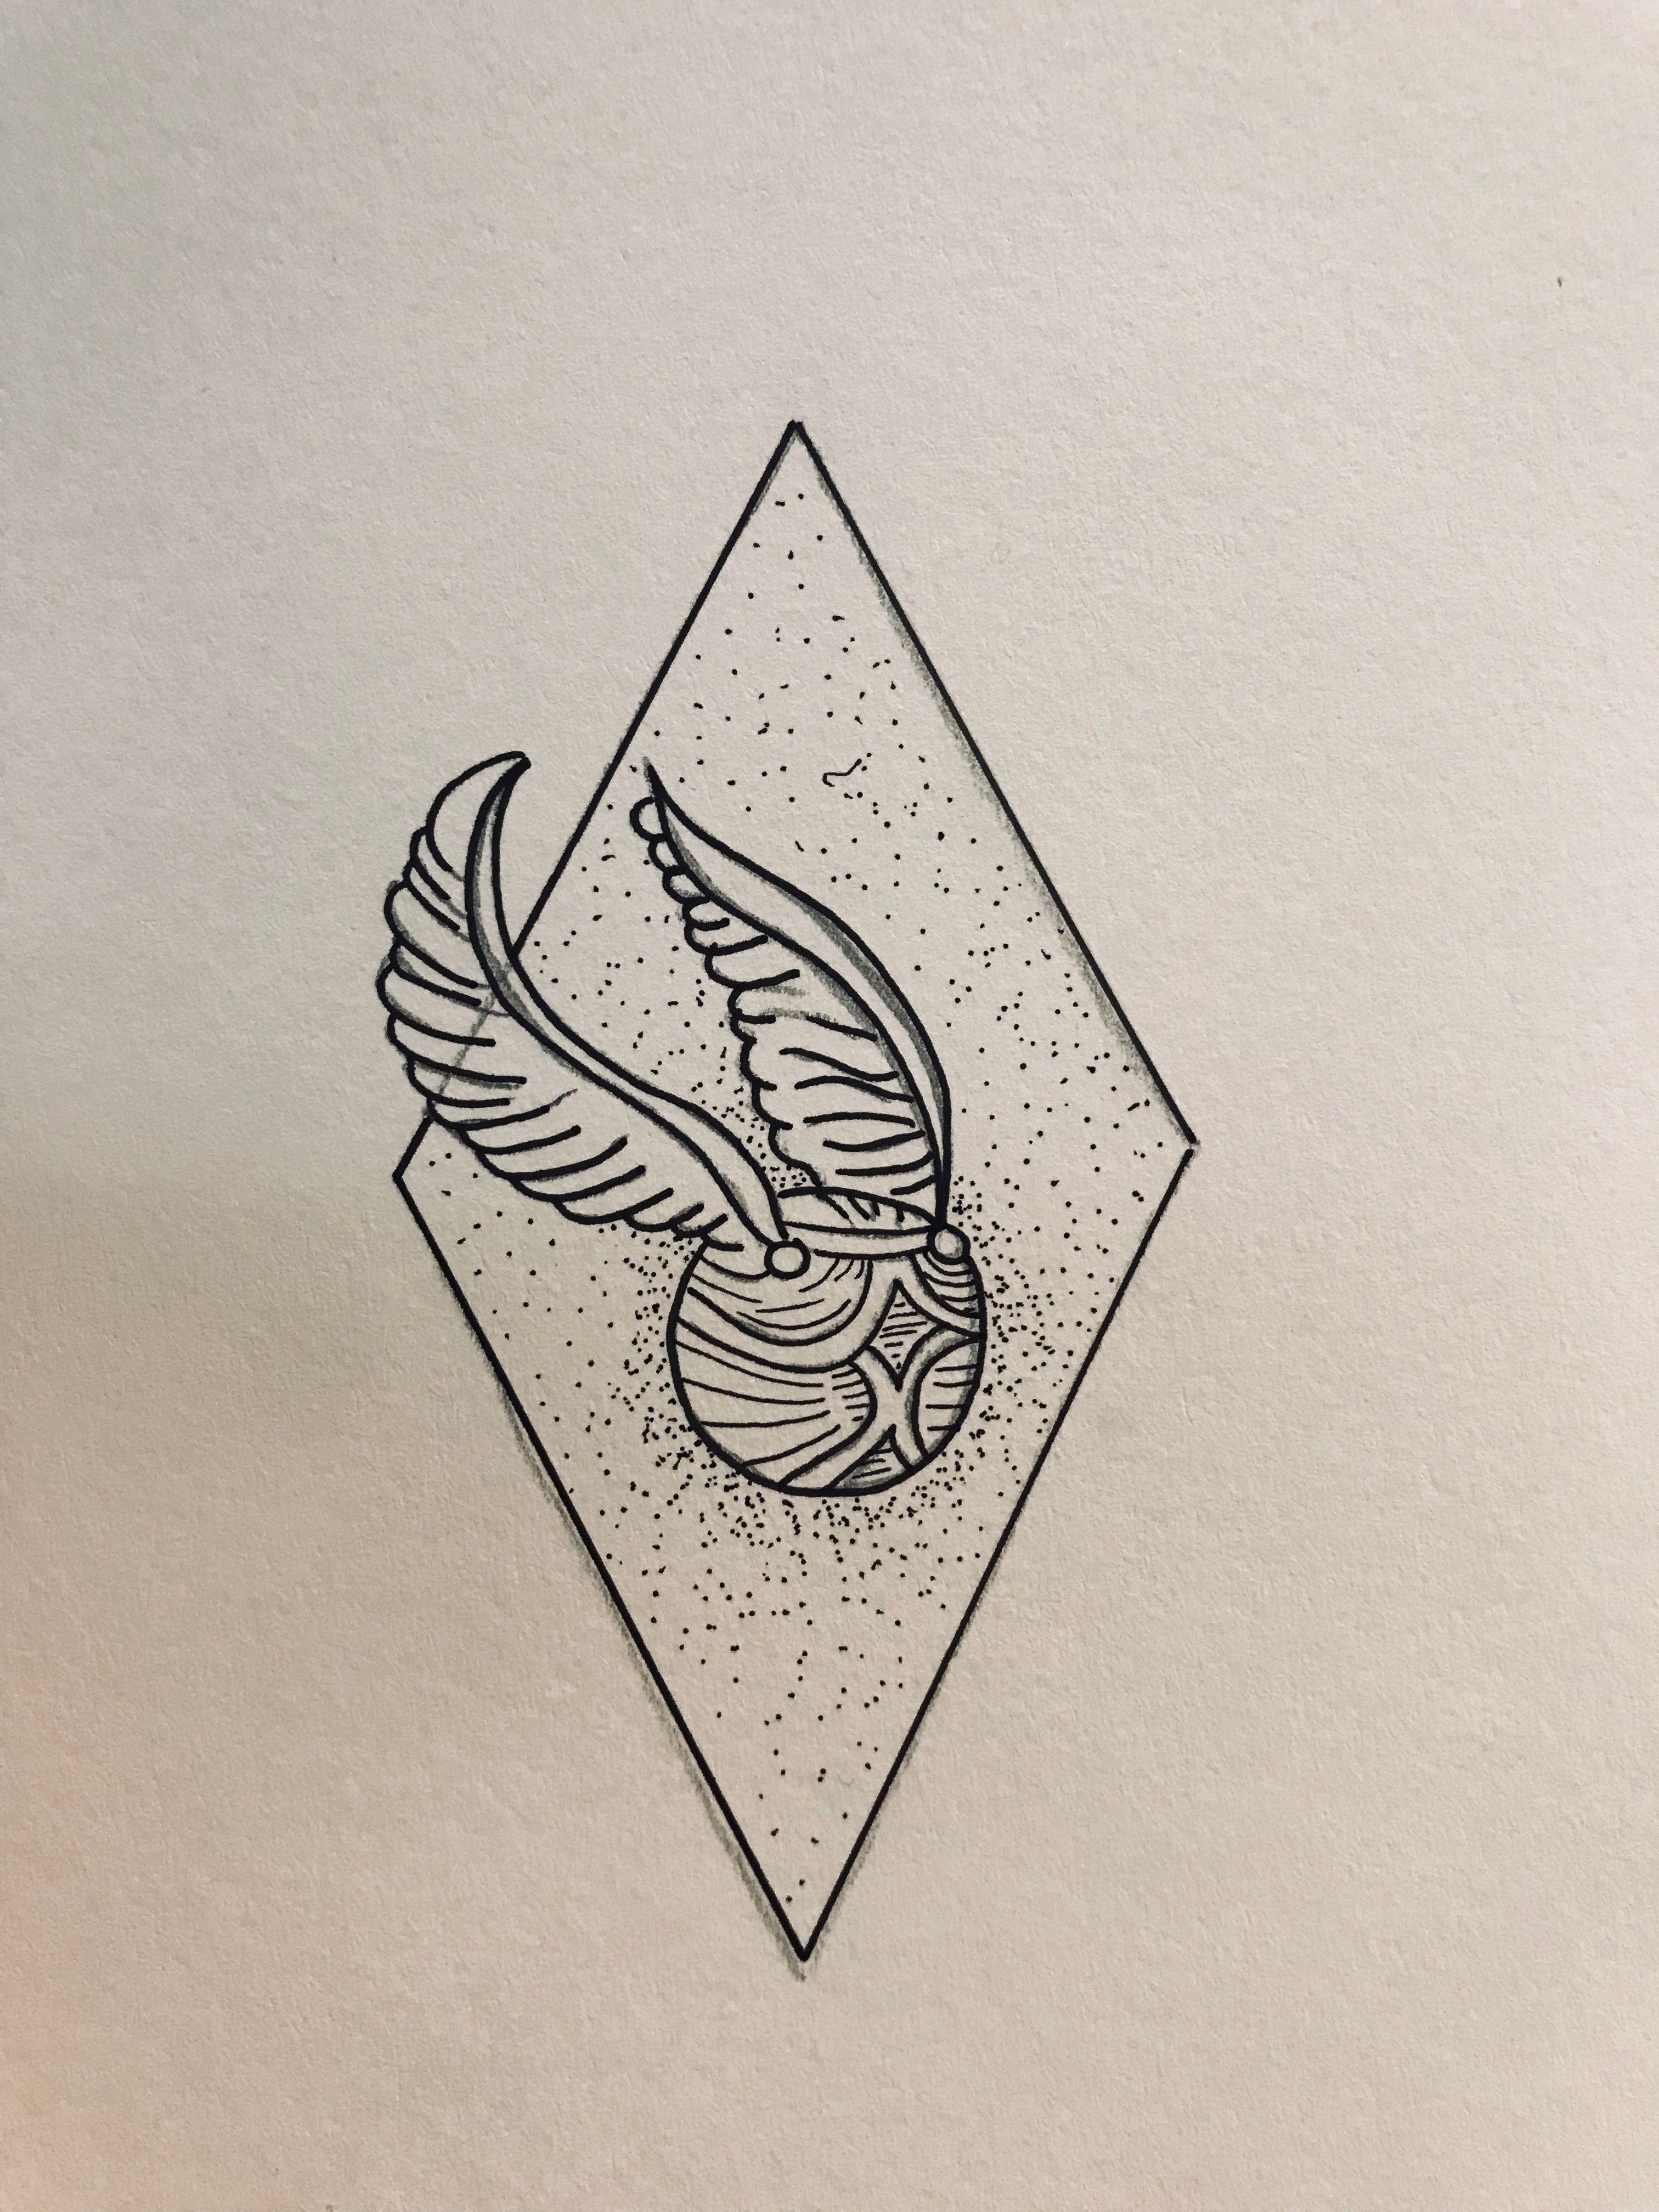 Harrypotter Drawings Harry Potter Sketch Harry Potter Tattoos